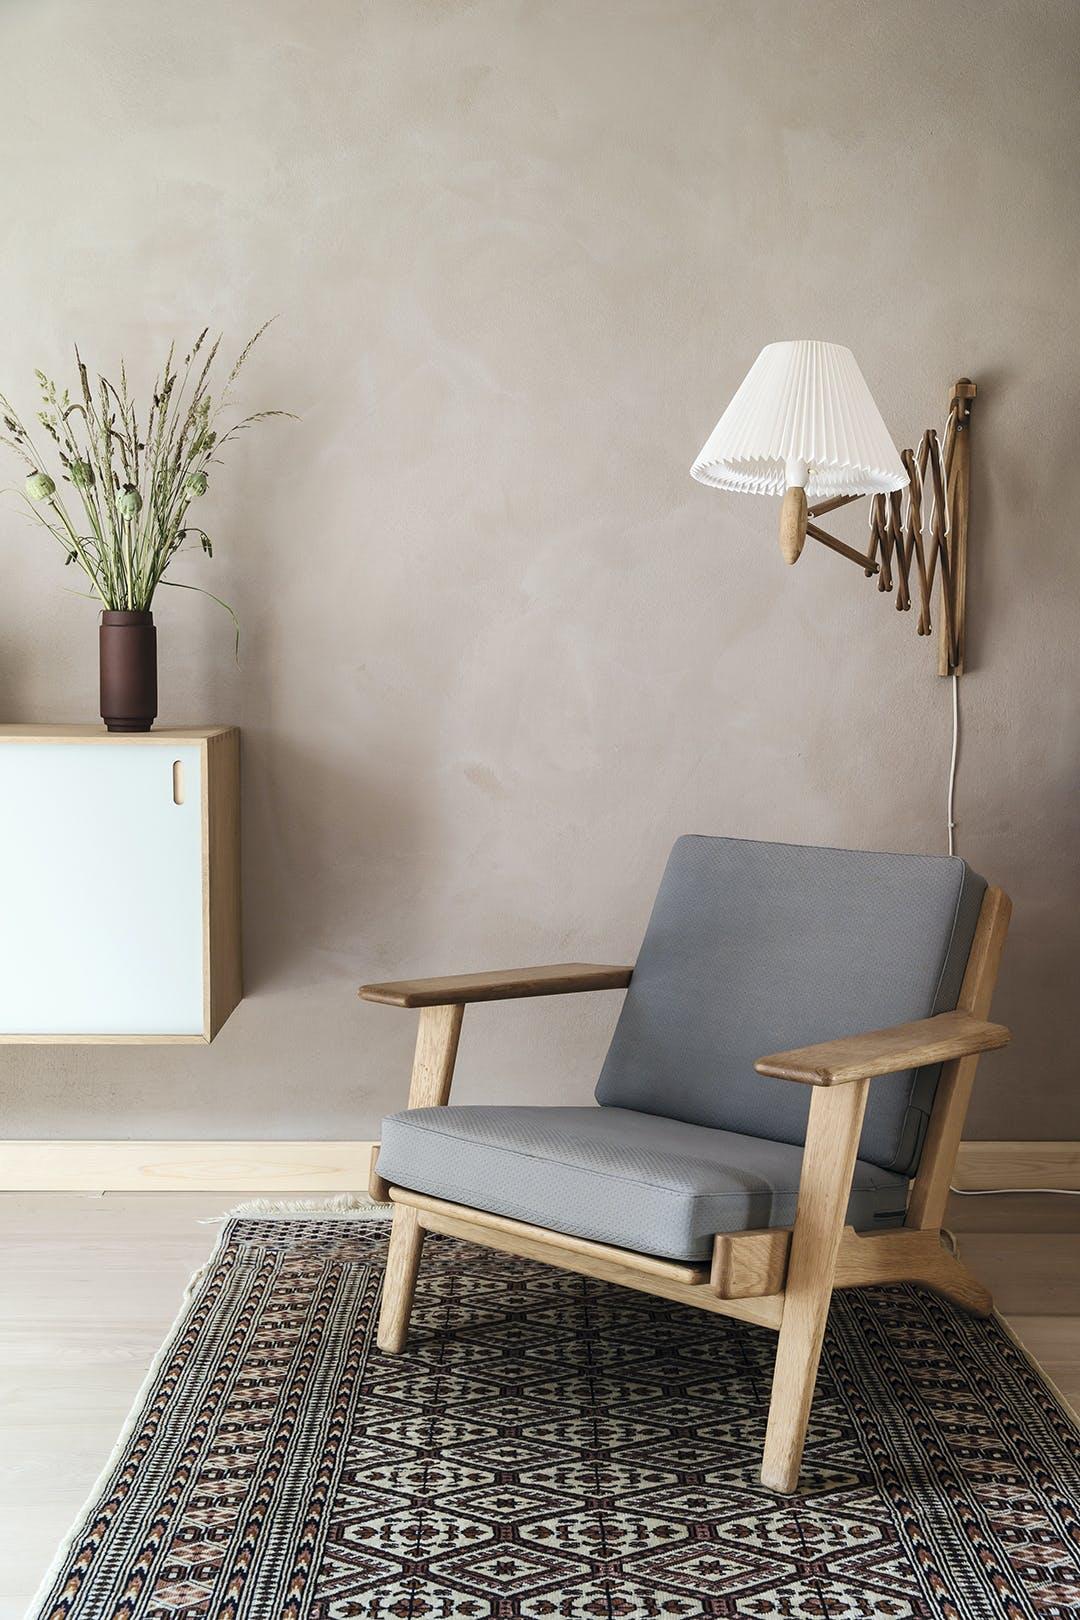 Lænestol indretning minimalistisk